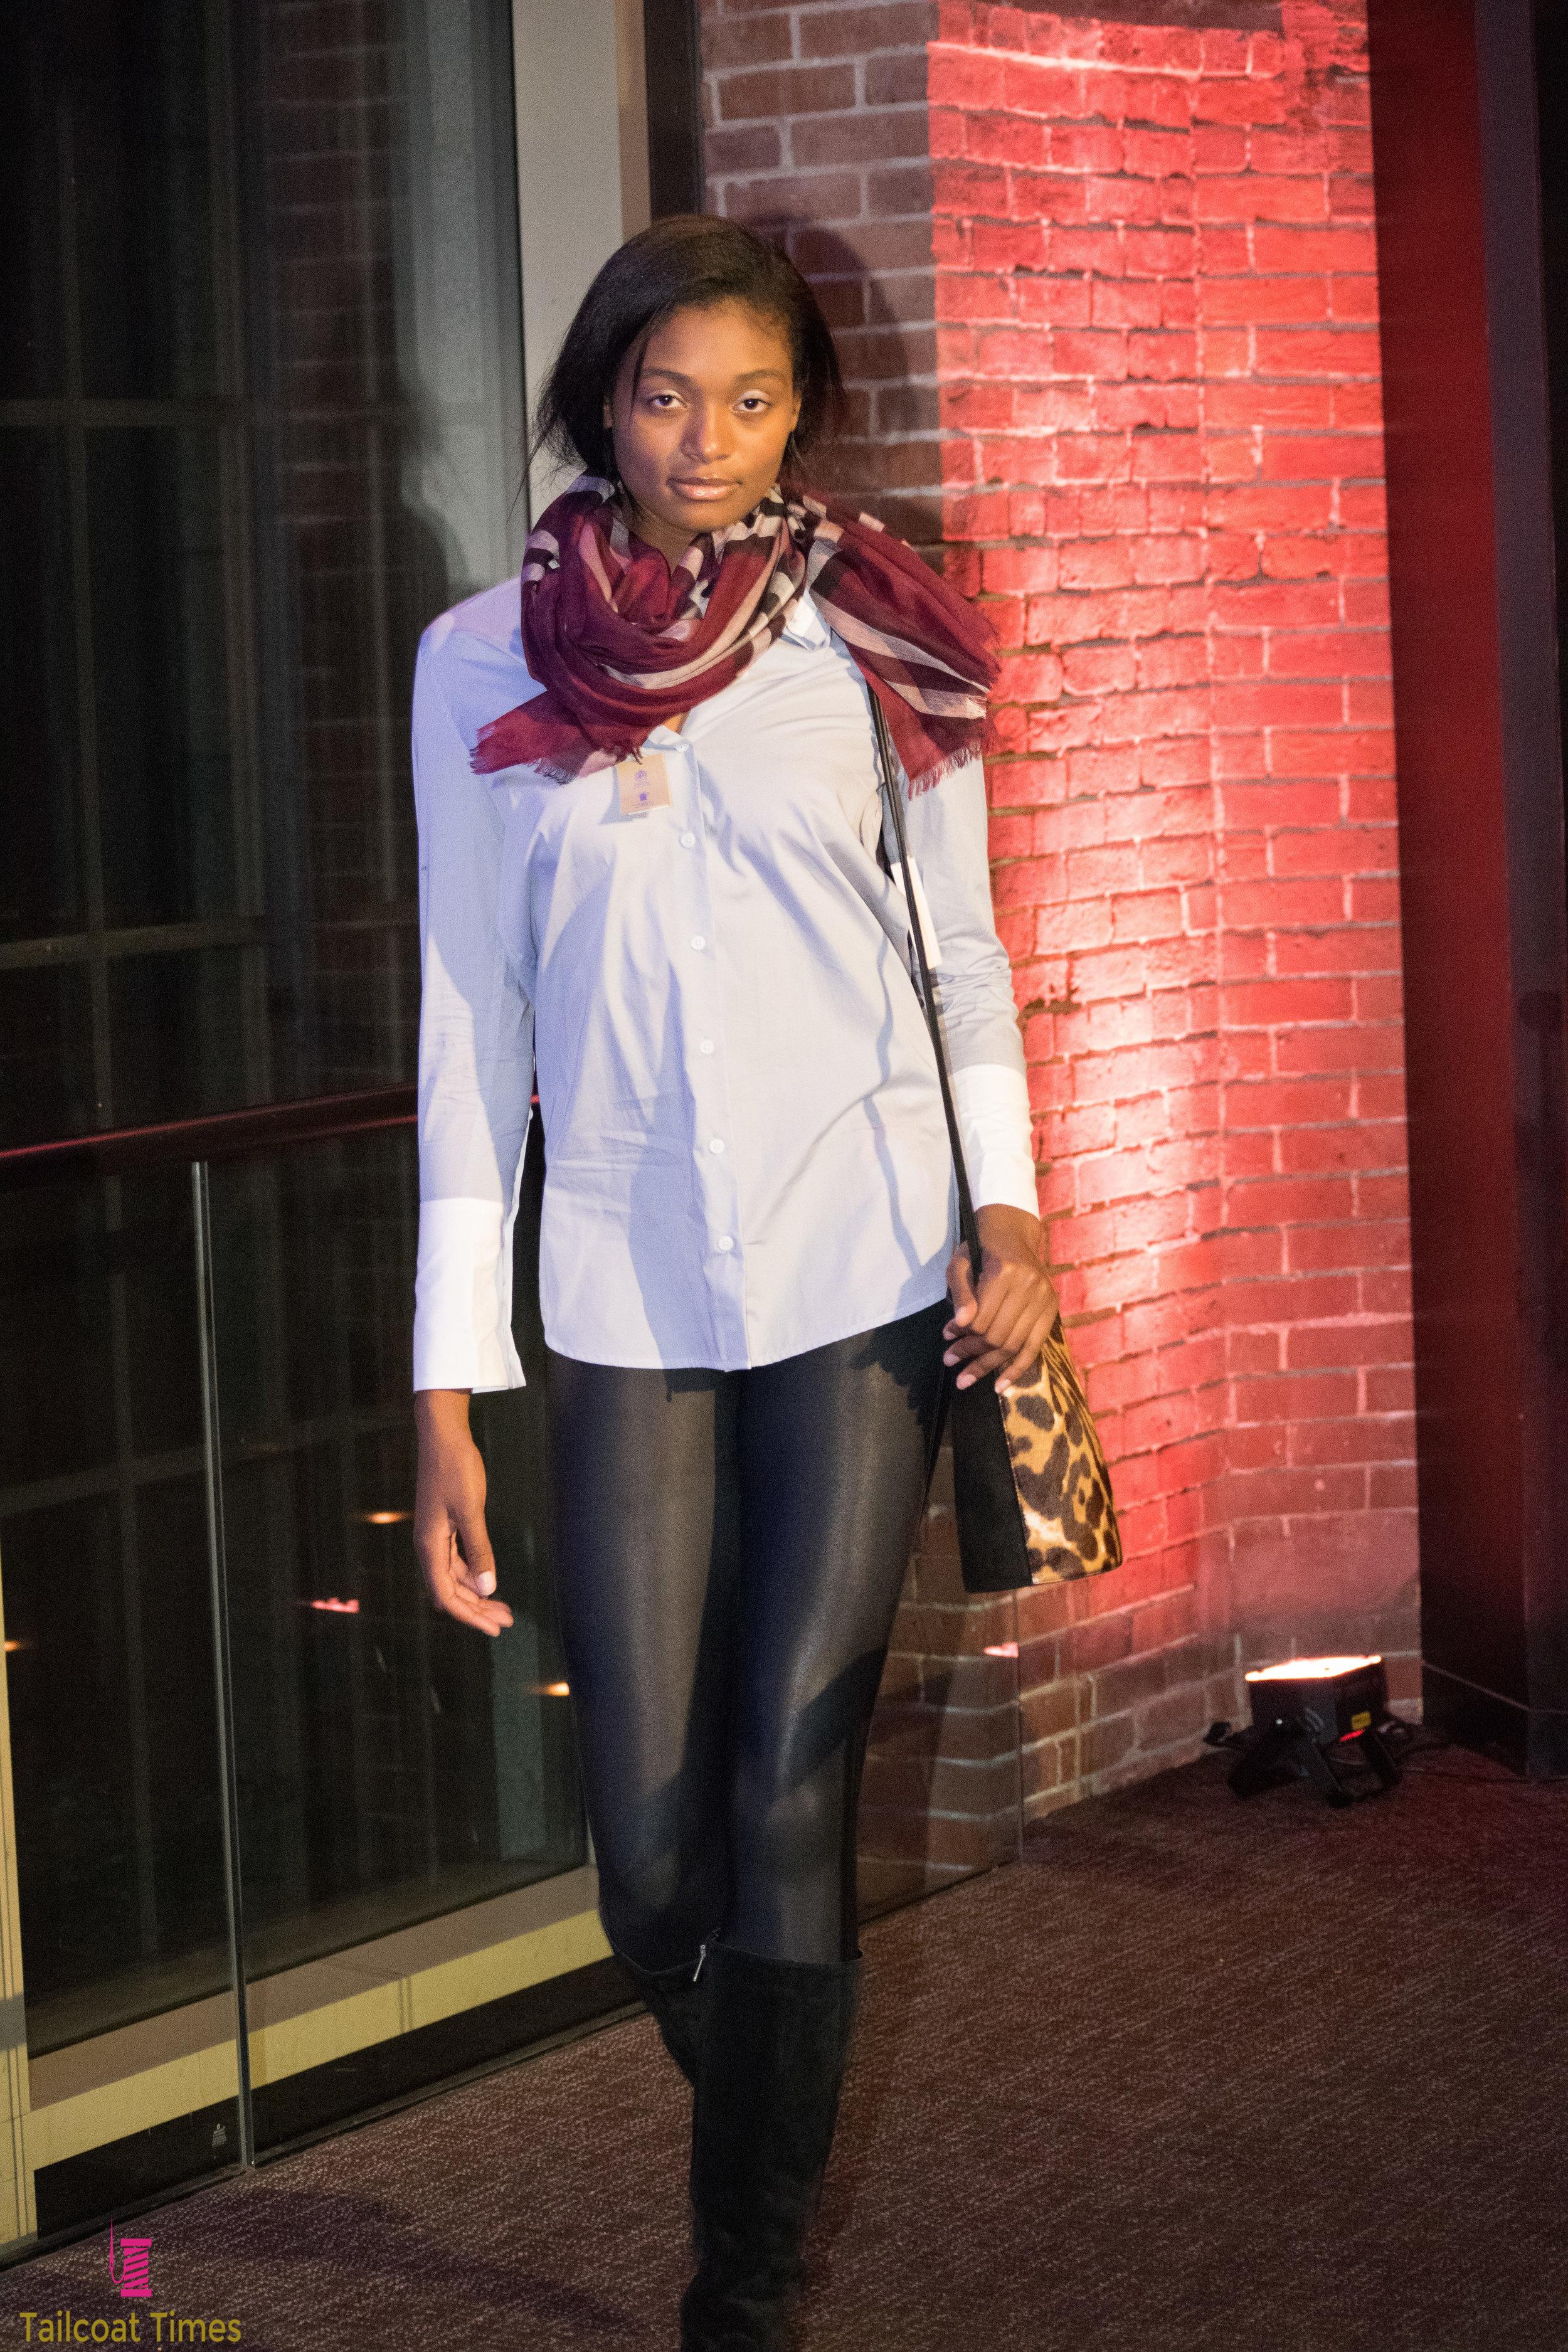 FashionablyLate_TrunkShow_Tailcoat Times (32 of 48).jpg